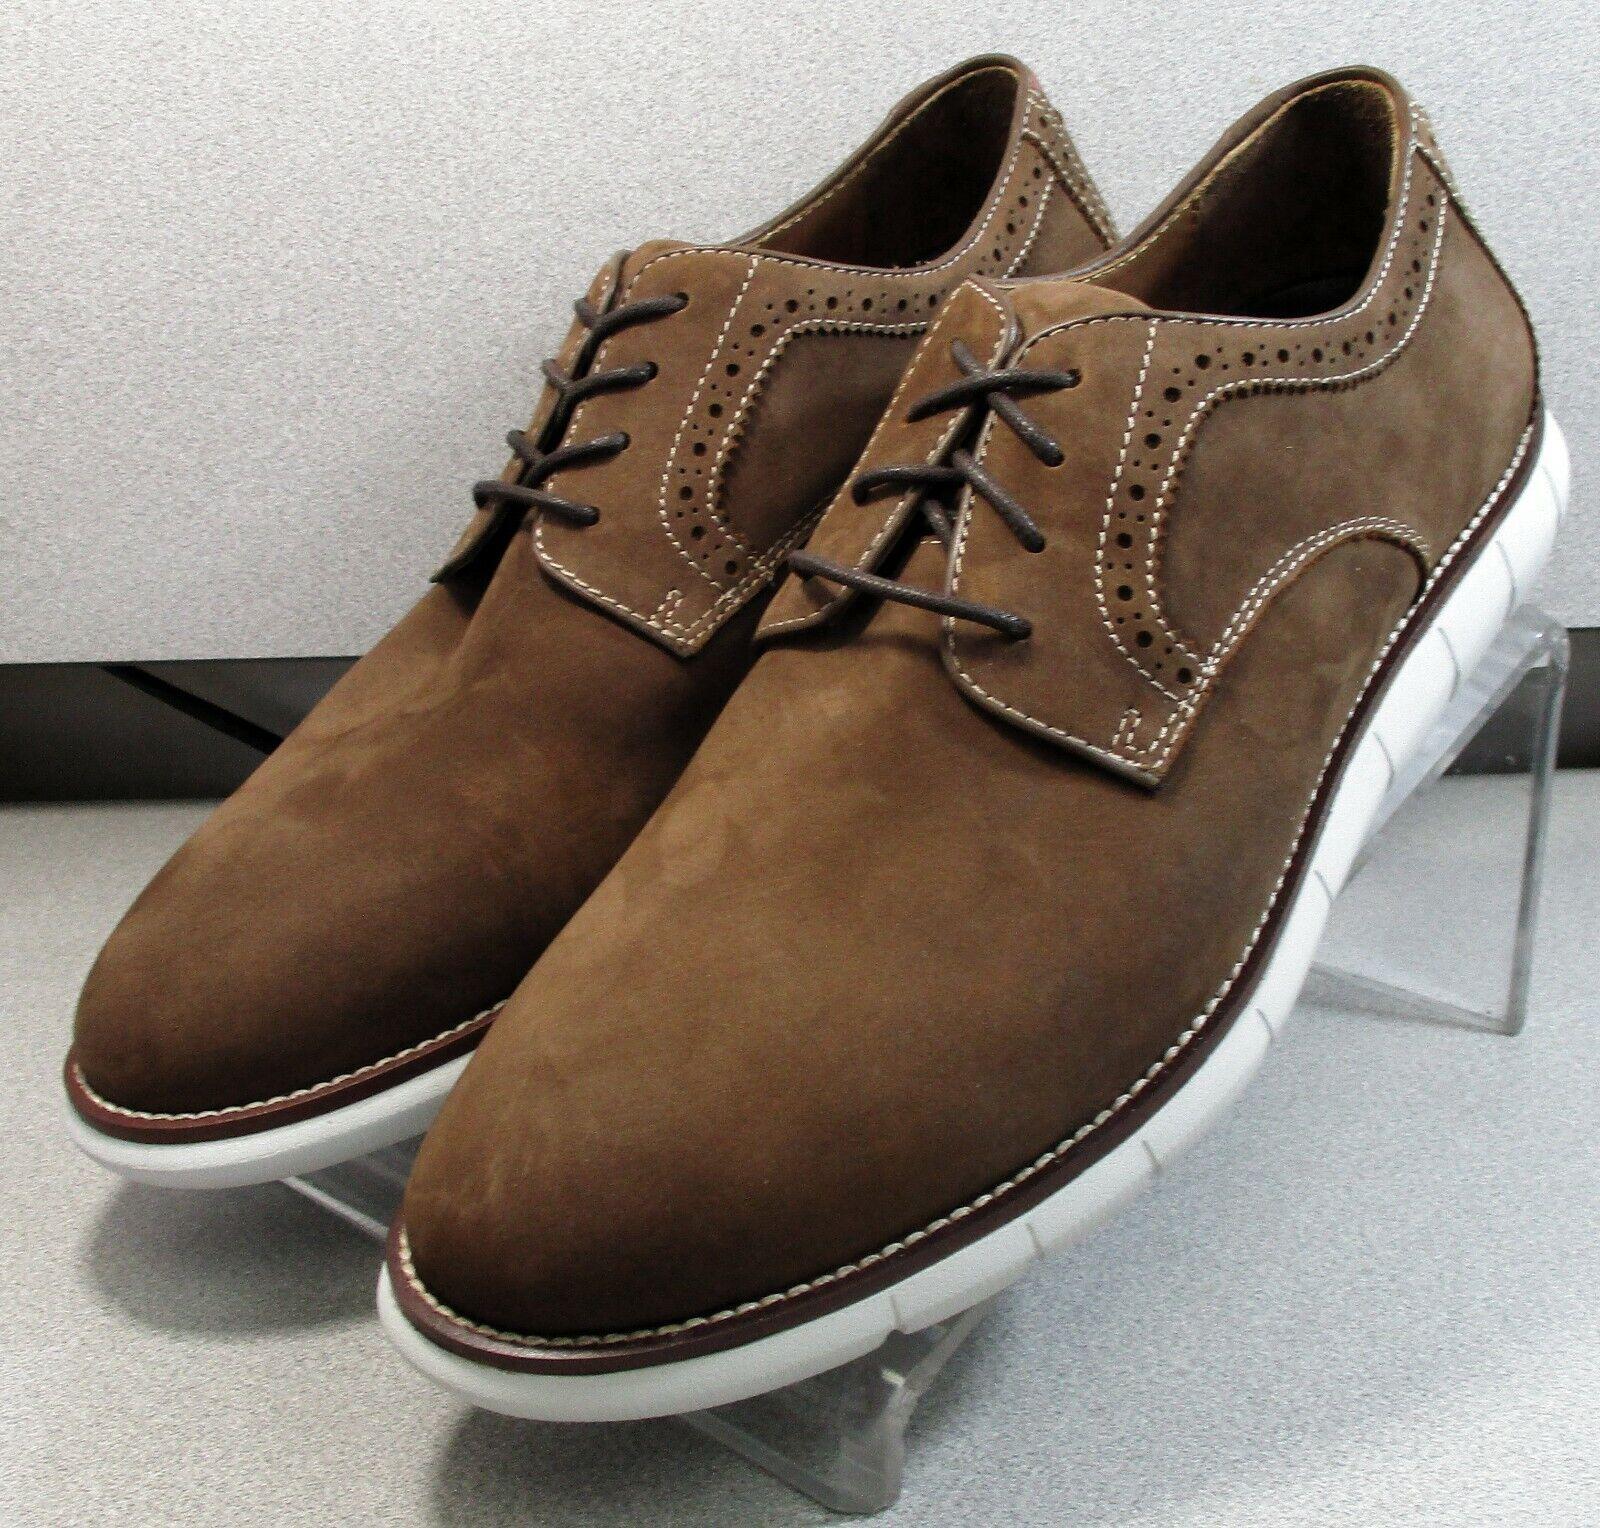 208372 SP50 Men's Shoes Size 9 M Brown Leather Lace Up Johnston & Murphy